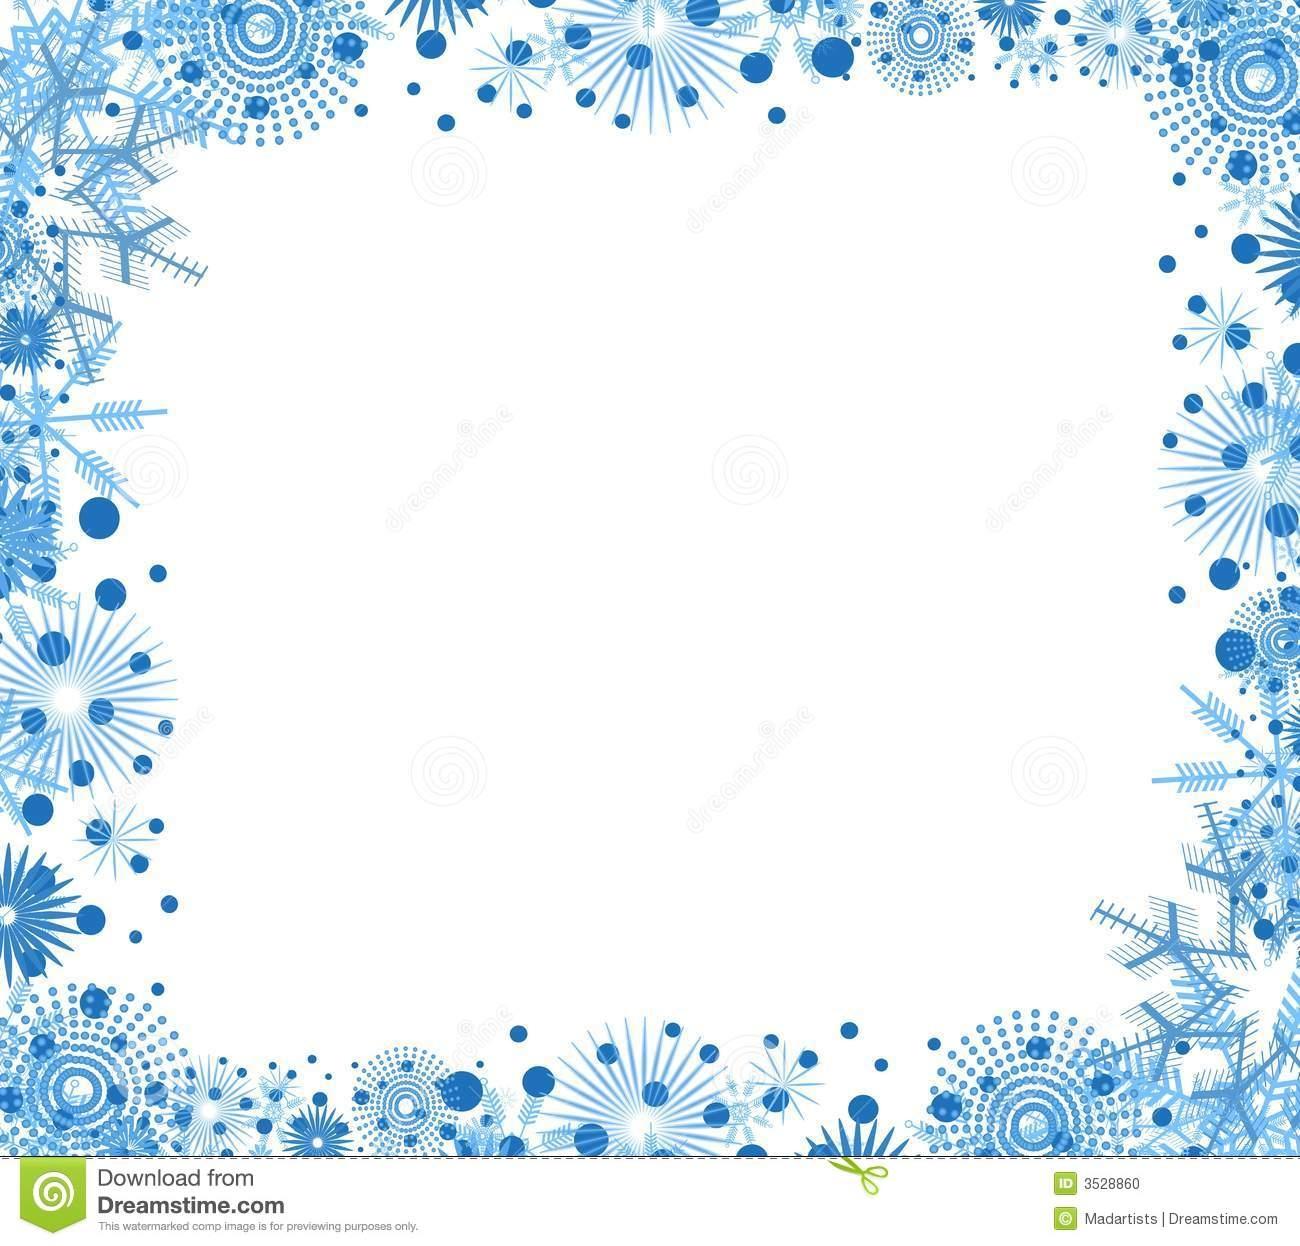 Clip Art Winter Borders-Clip Art Winter Borders-4